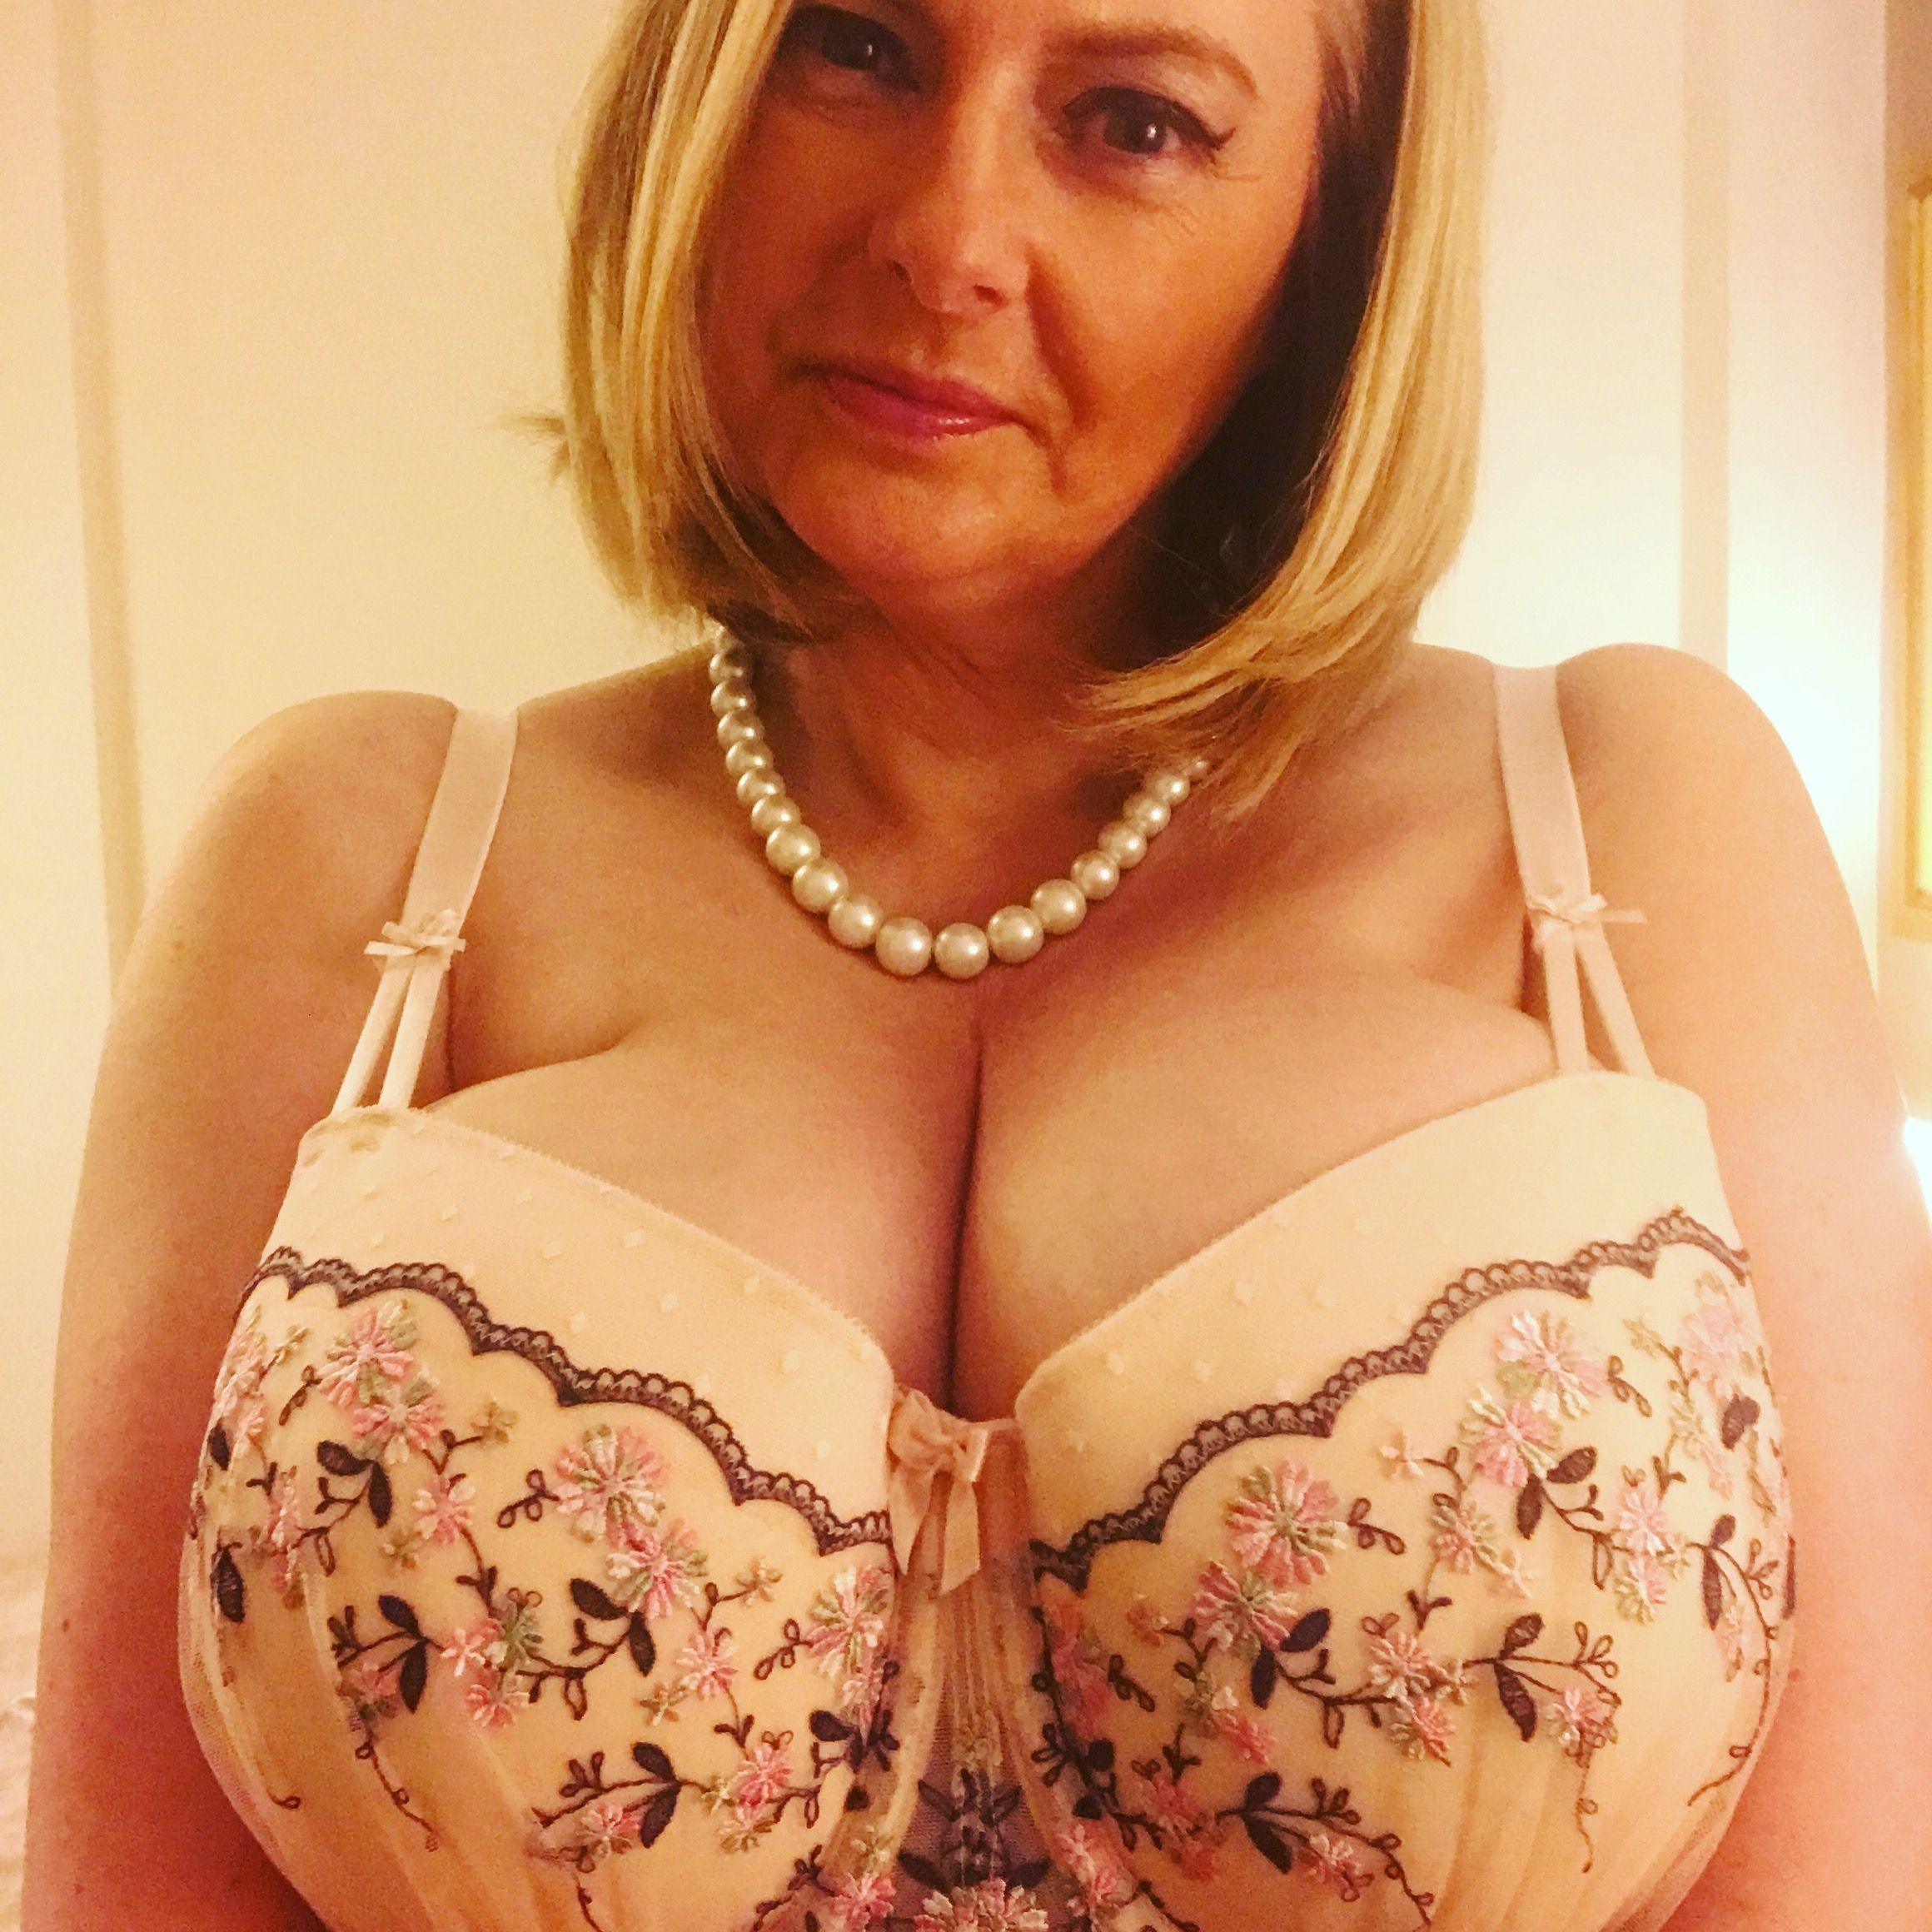 b8e29c59d4 Retro pink lace full 34h bra